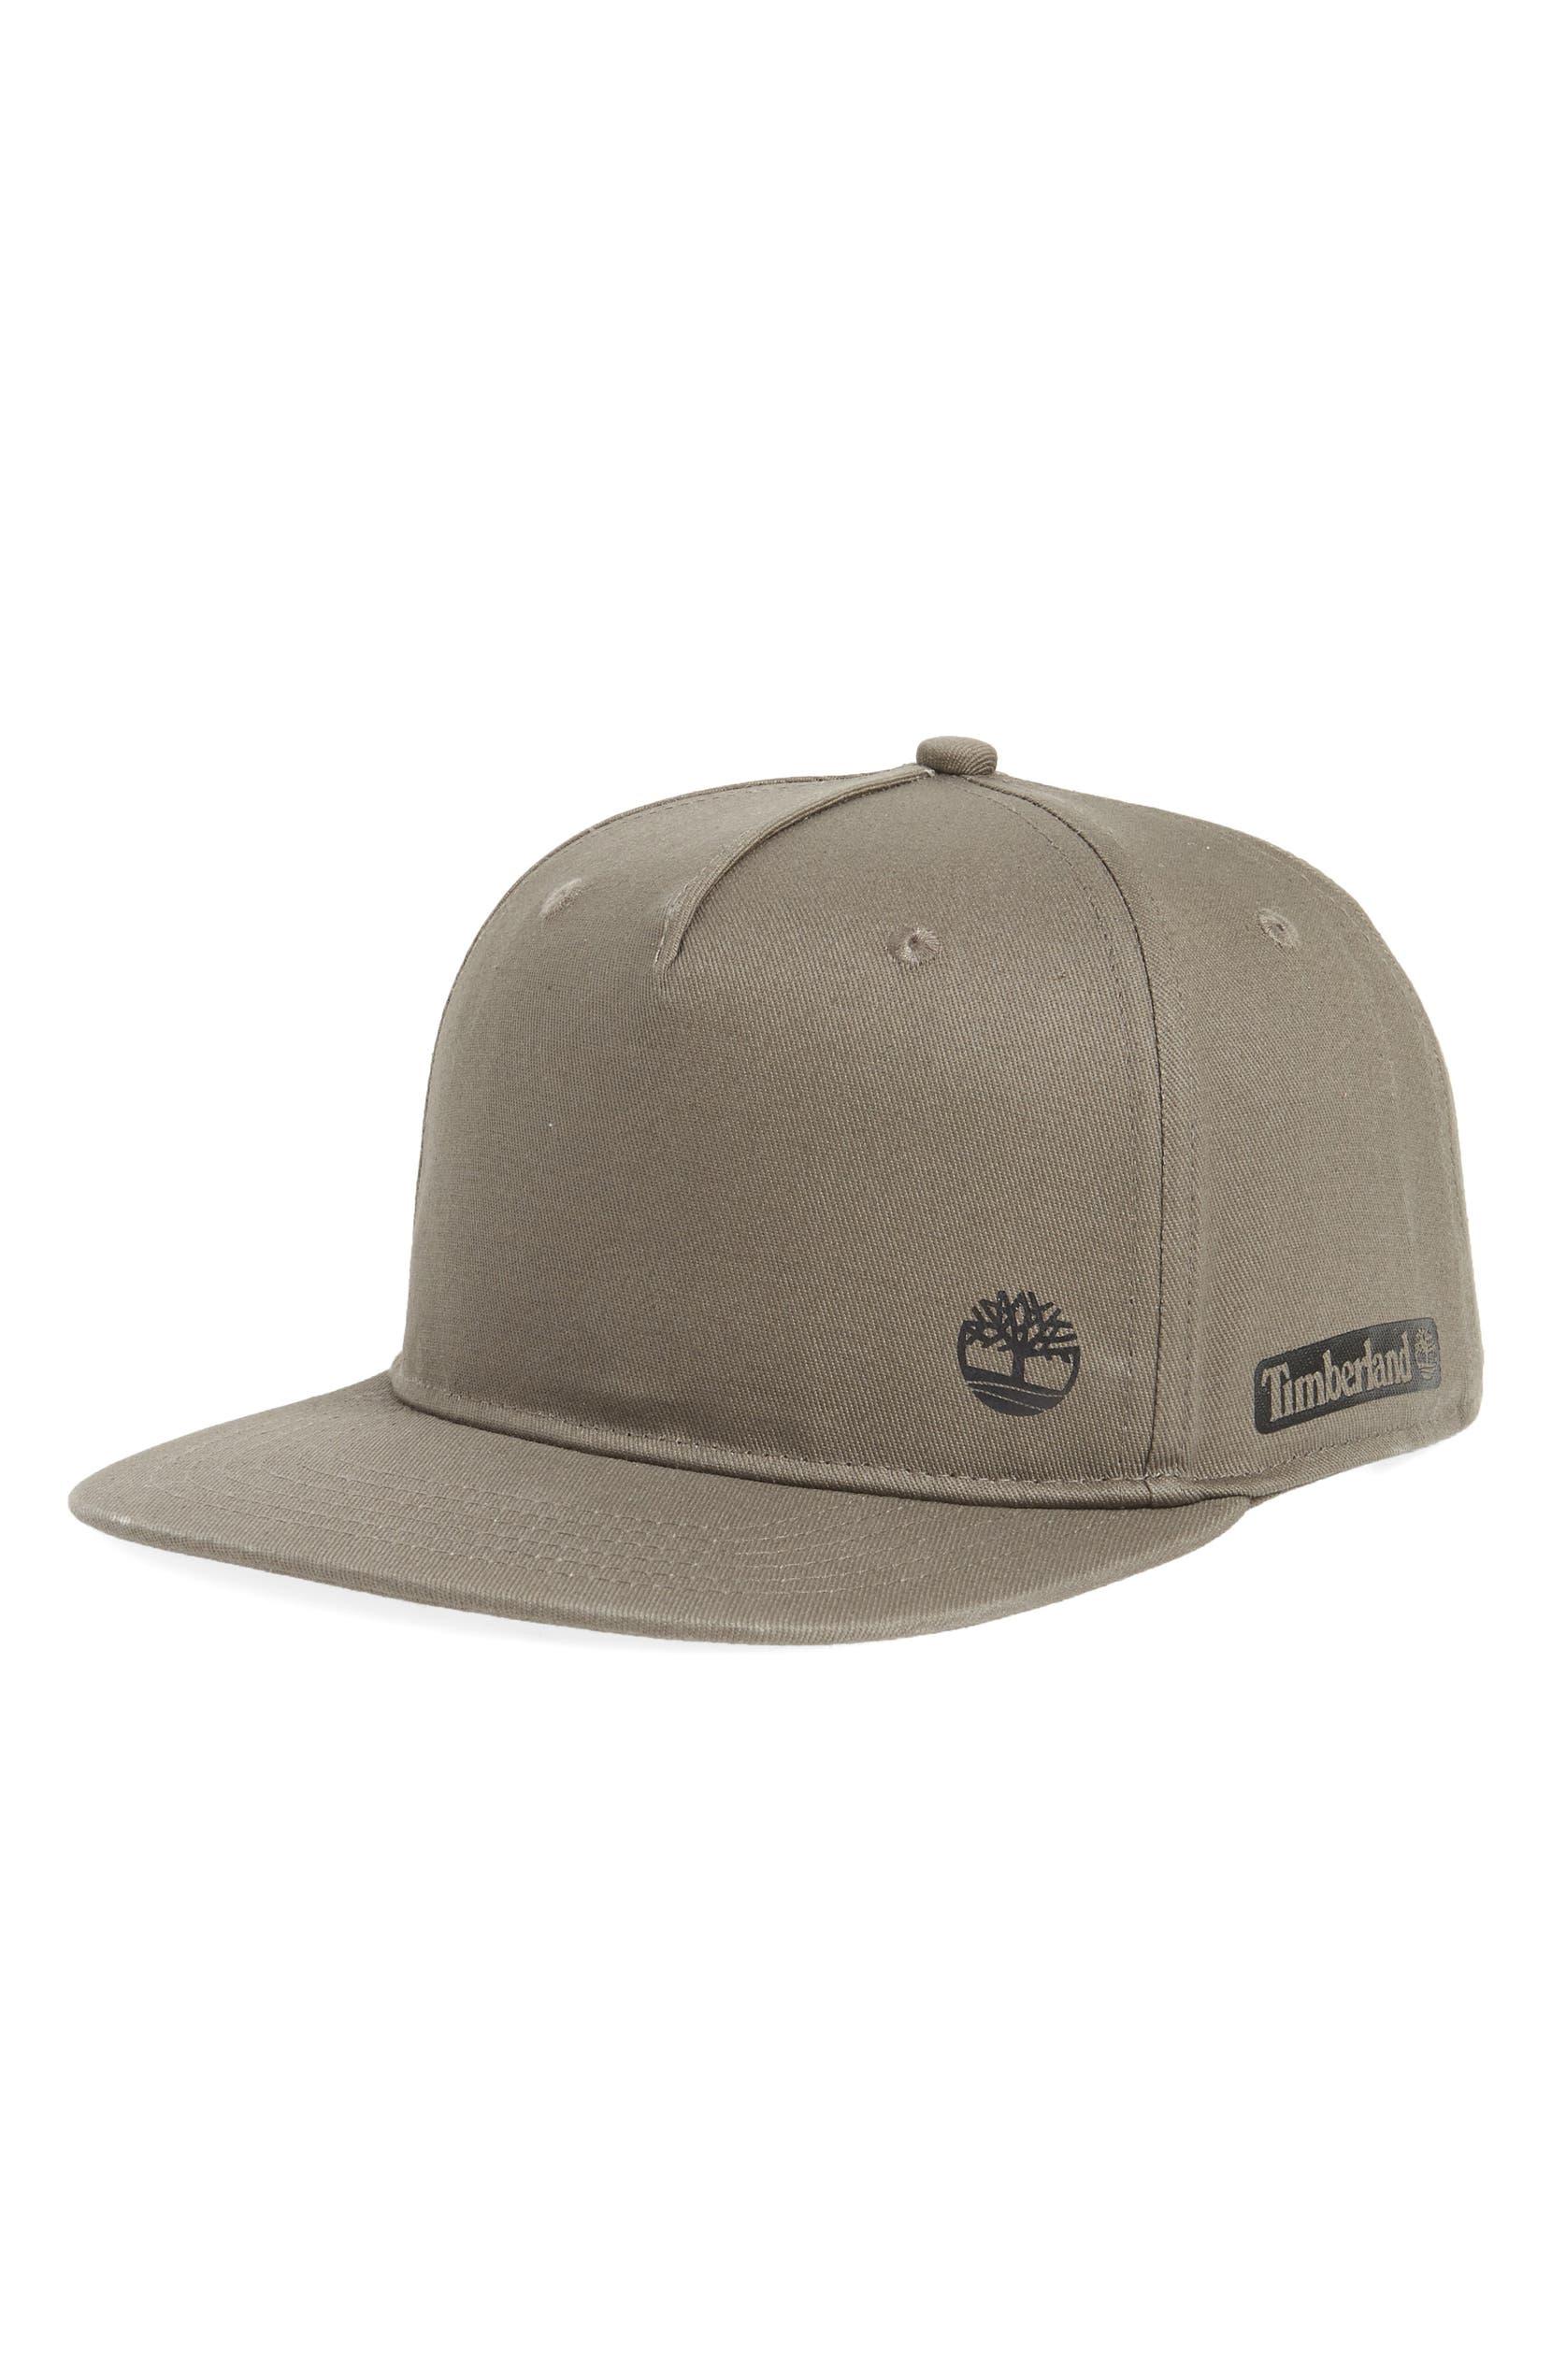 Timberland Castle Hill Baseball Cap  5ccb1bc468f